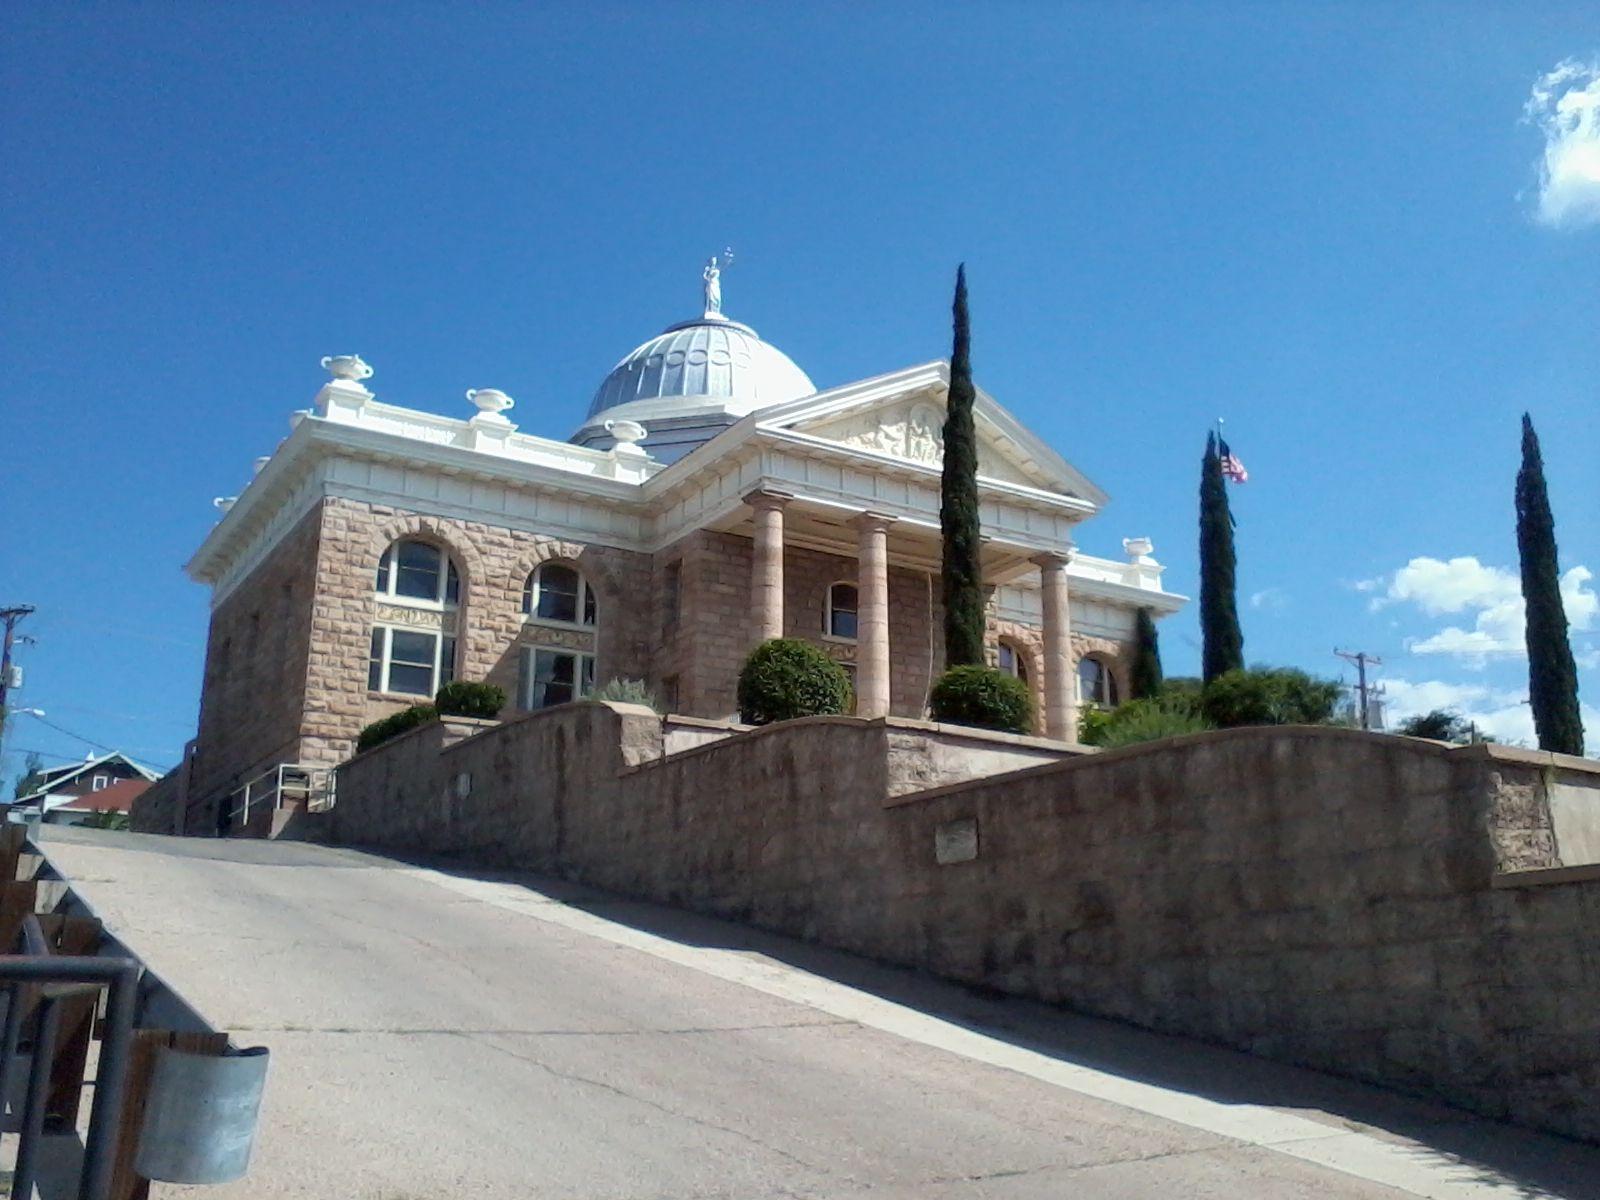 Historic santa cruz county courthouse nogales az k1k mi casa es tu casa arizona - Casa santa cruz ...